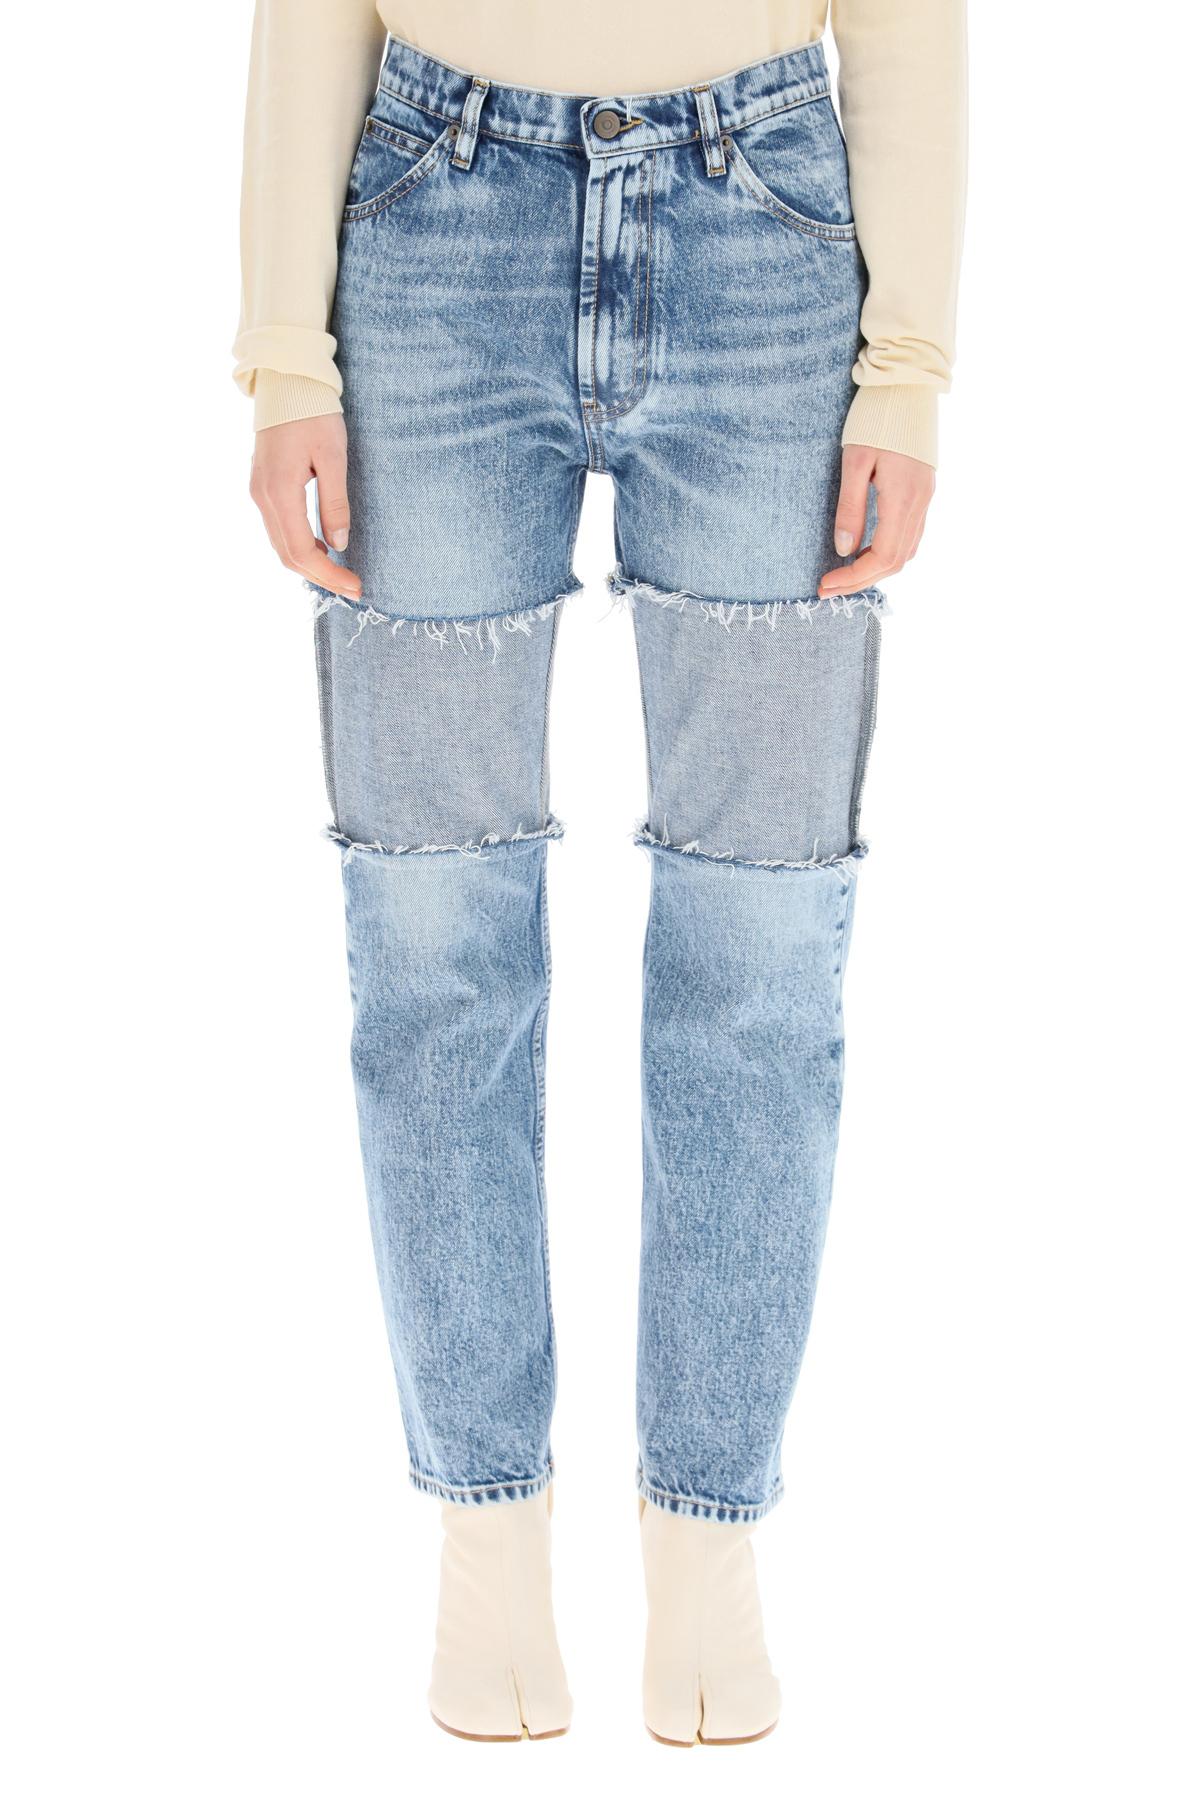 Maison margiela jeans spliced in denim